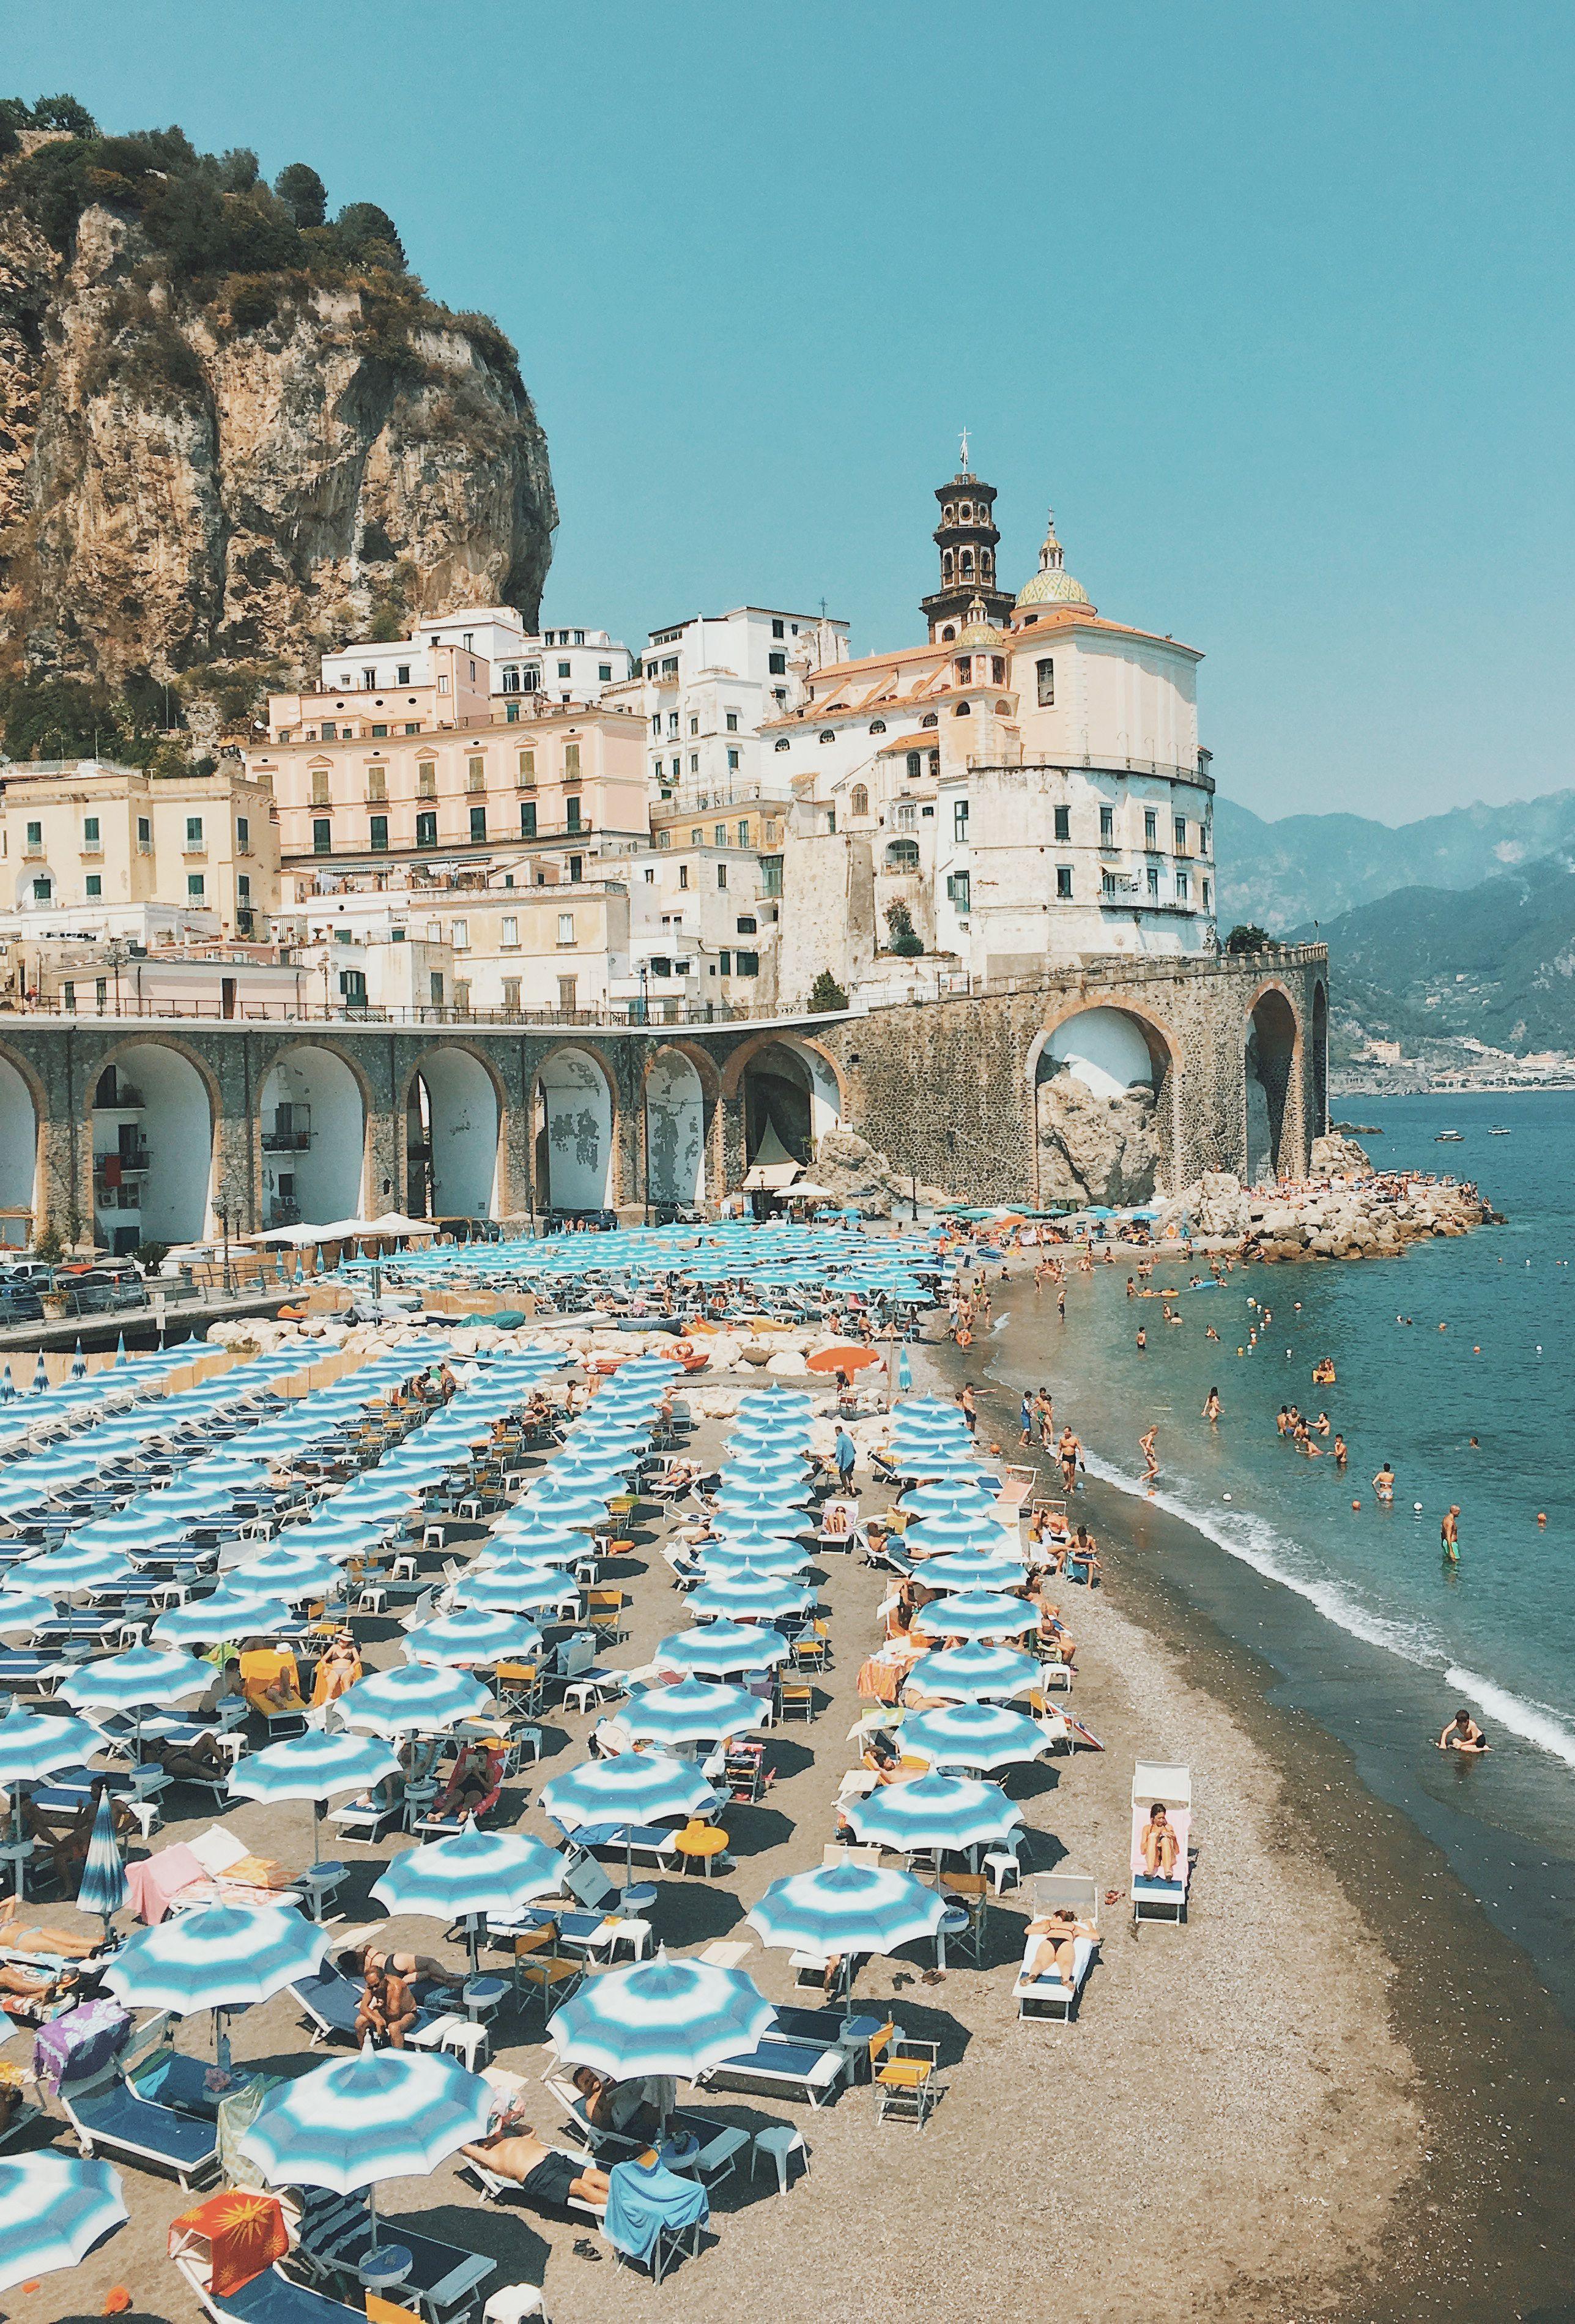 Pin By Satin Pine On Italy Luxury Beach Vacation Amalfi